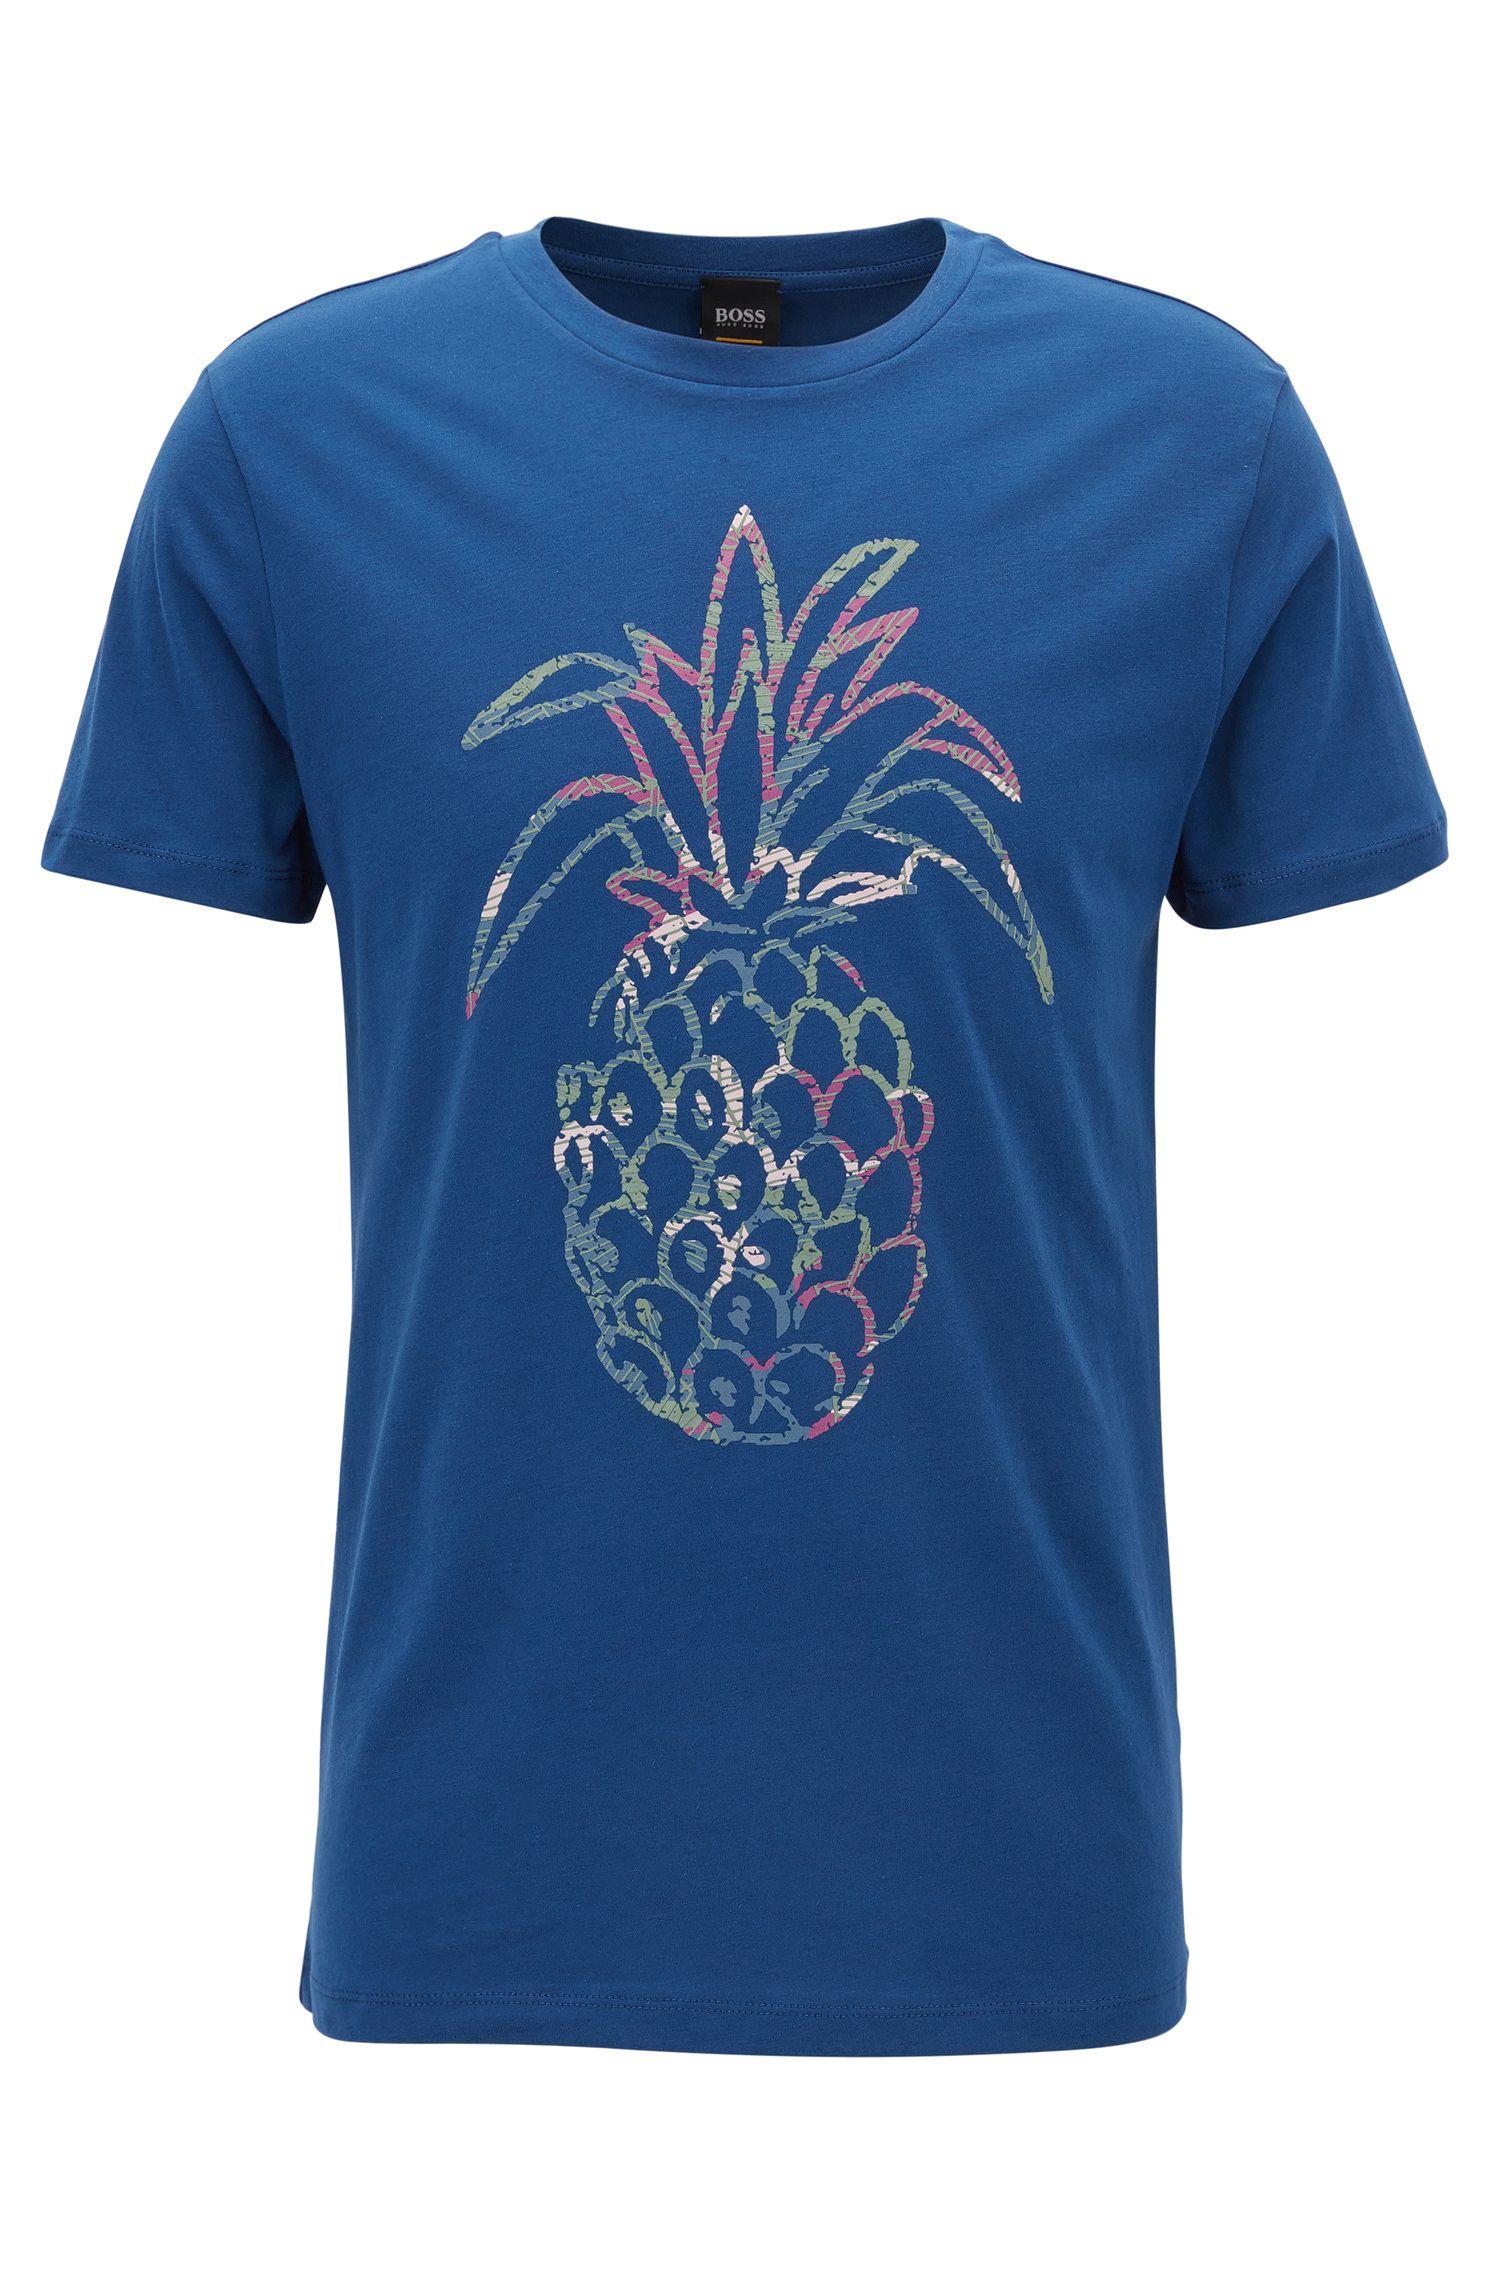 Pineapple Cotton Jersey Graphic T-Shirt | Tauno